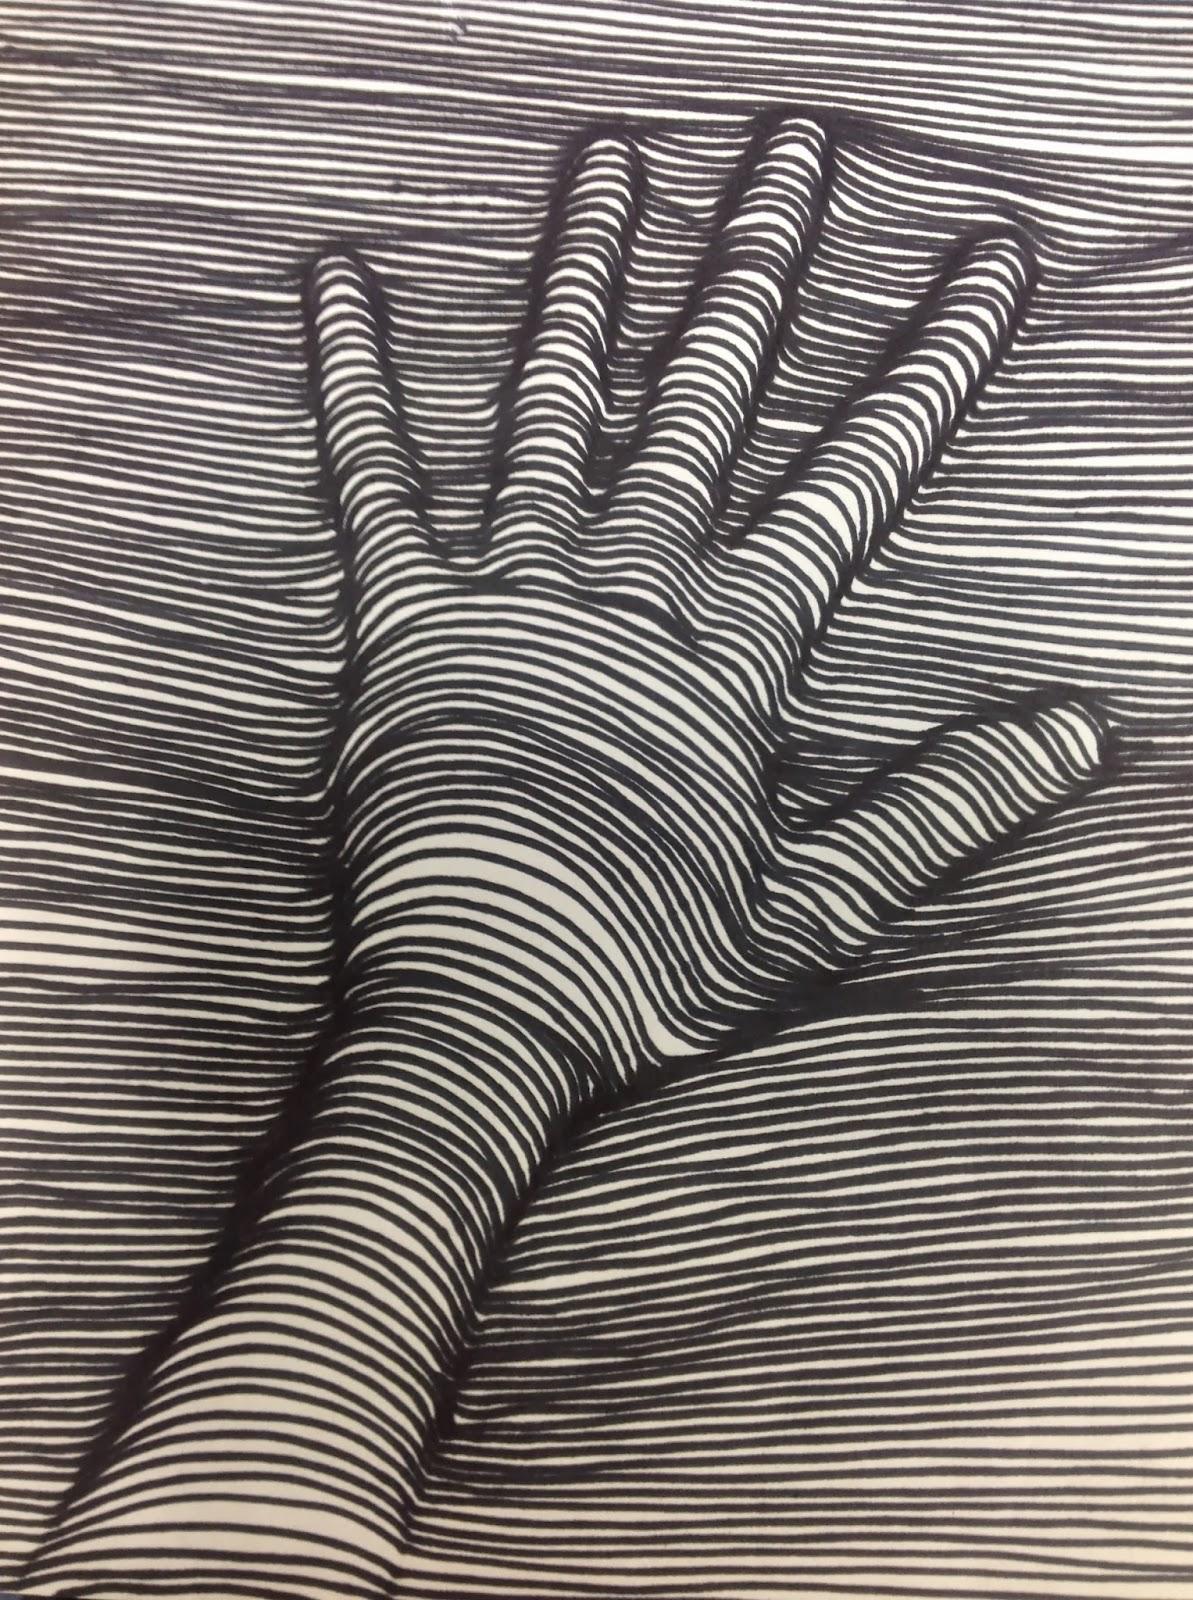 Miss Arty Pants: Contour Line Drawings